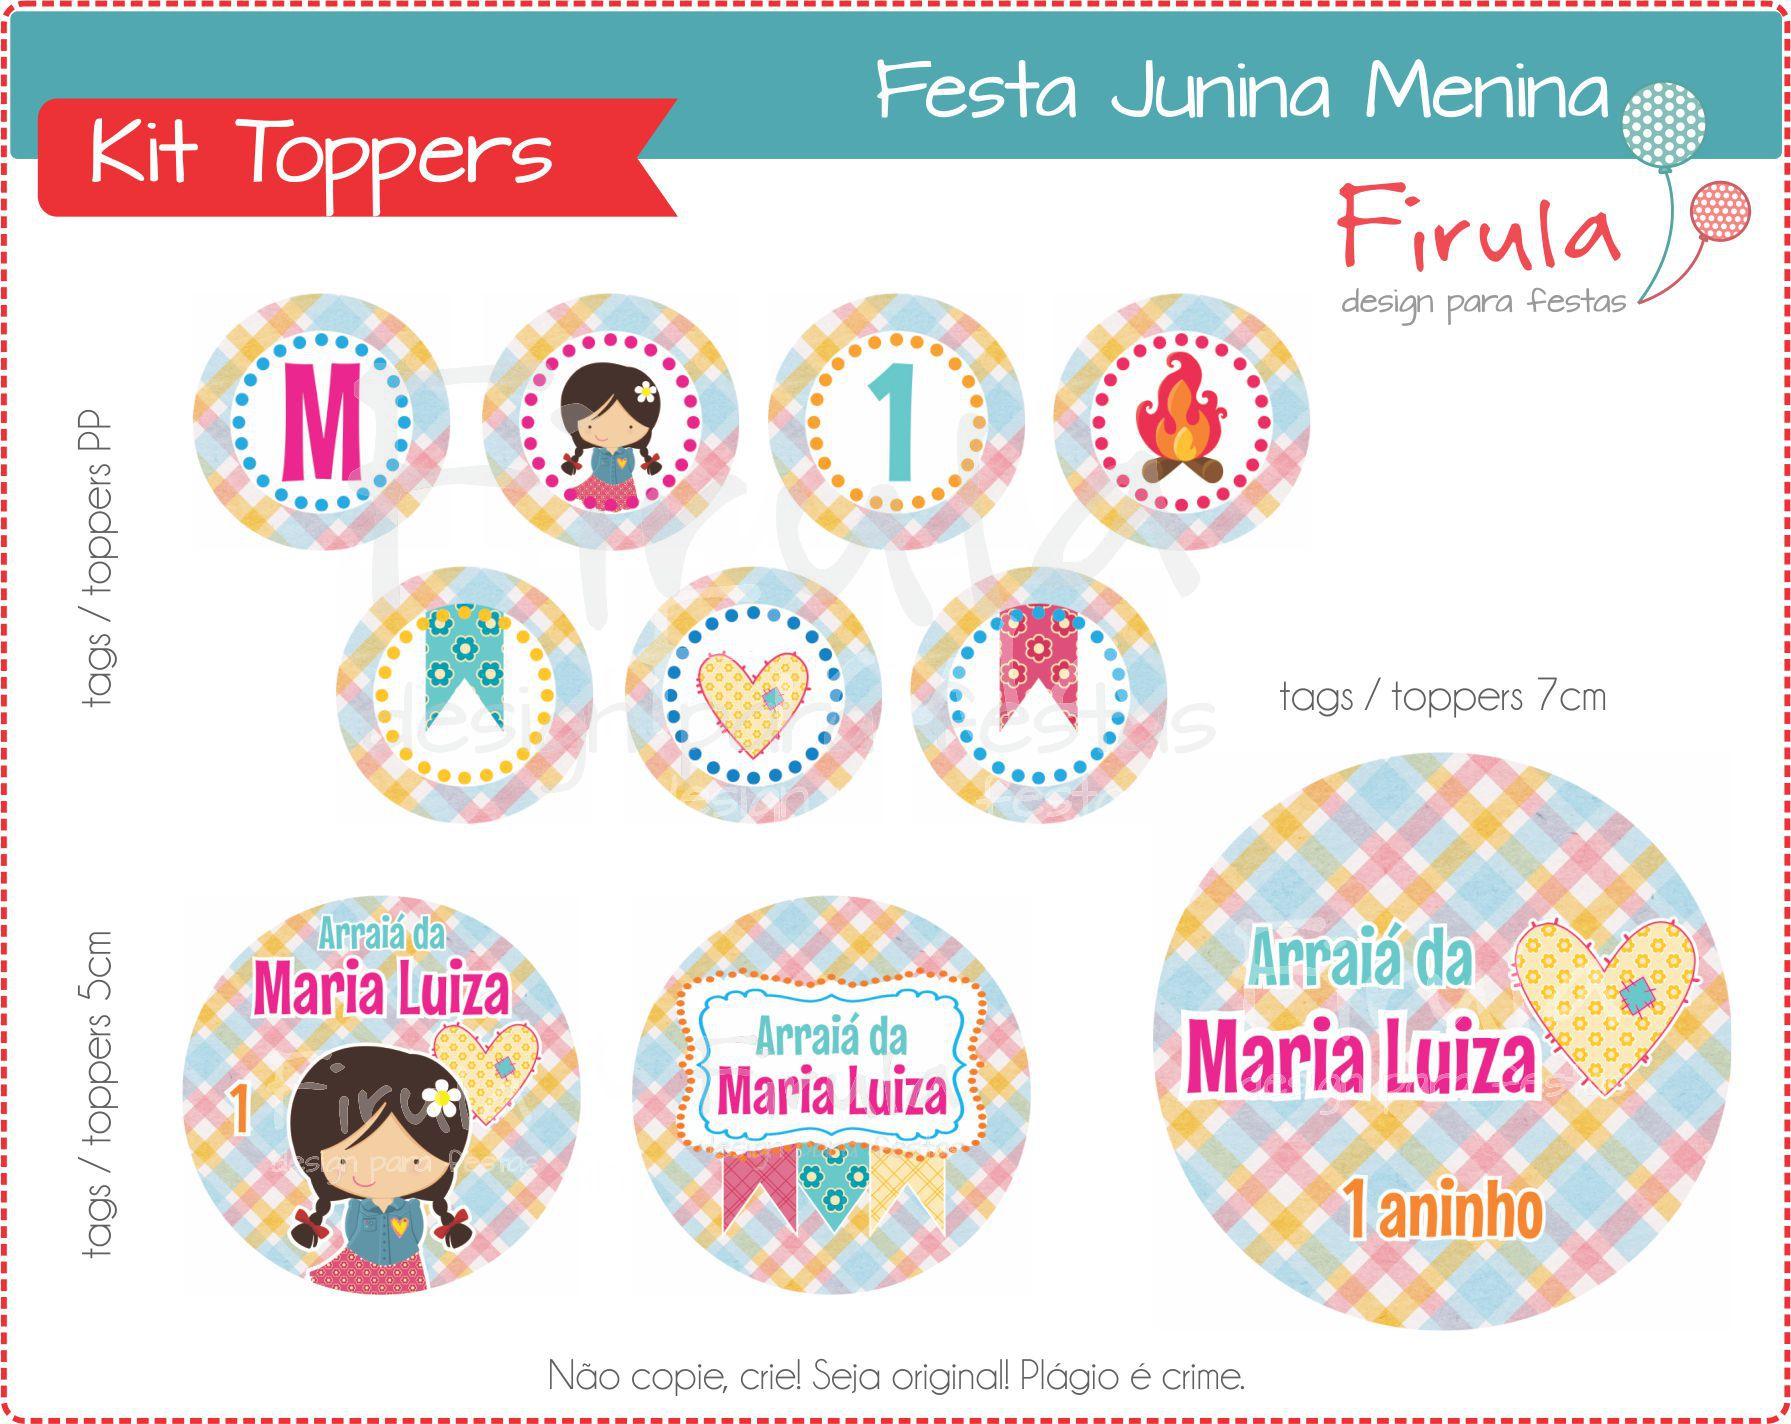 Kit Digital Toppers Festa Junina No Elo7 Firula Festas 6edaaf